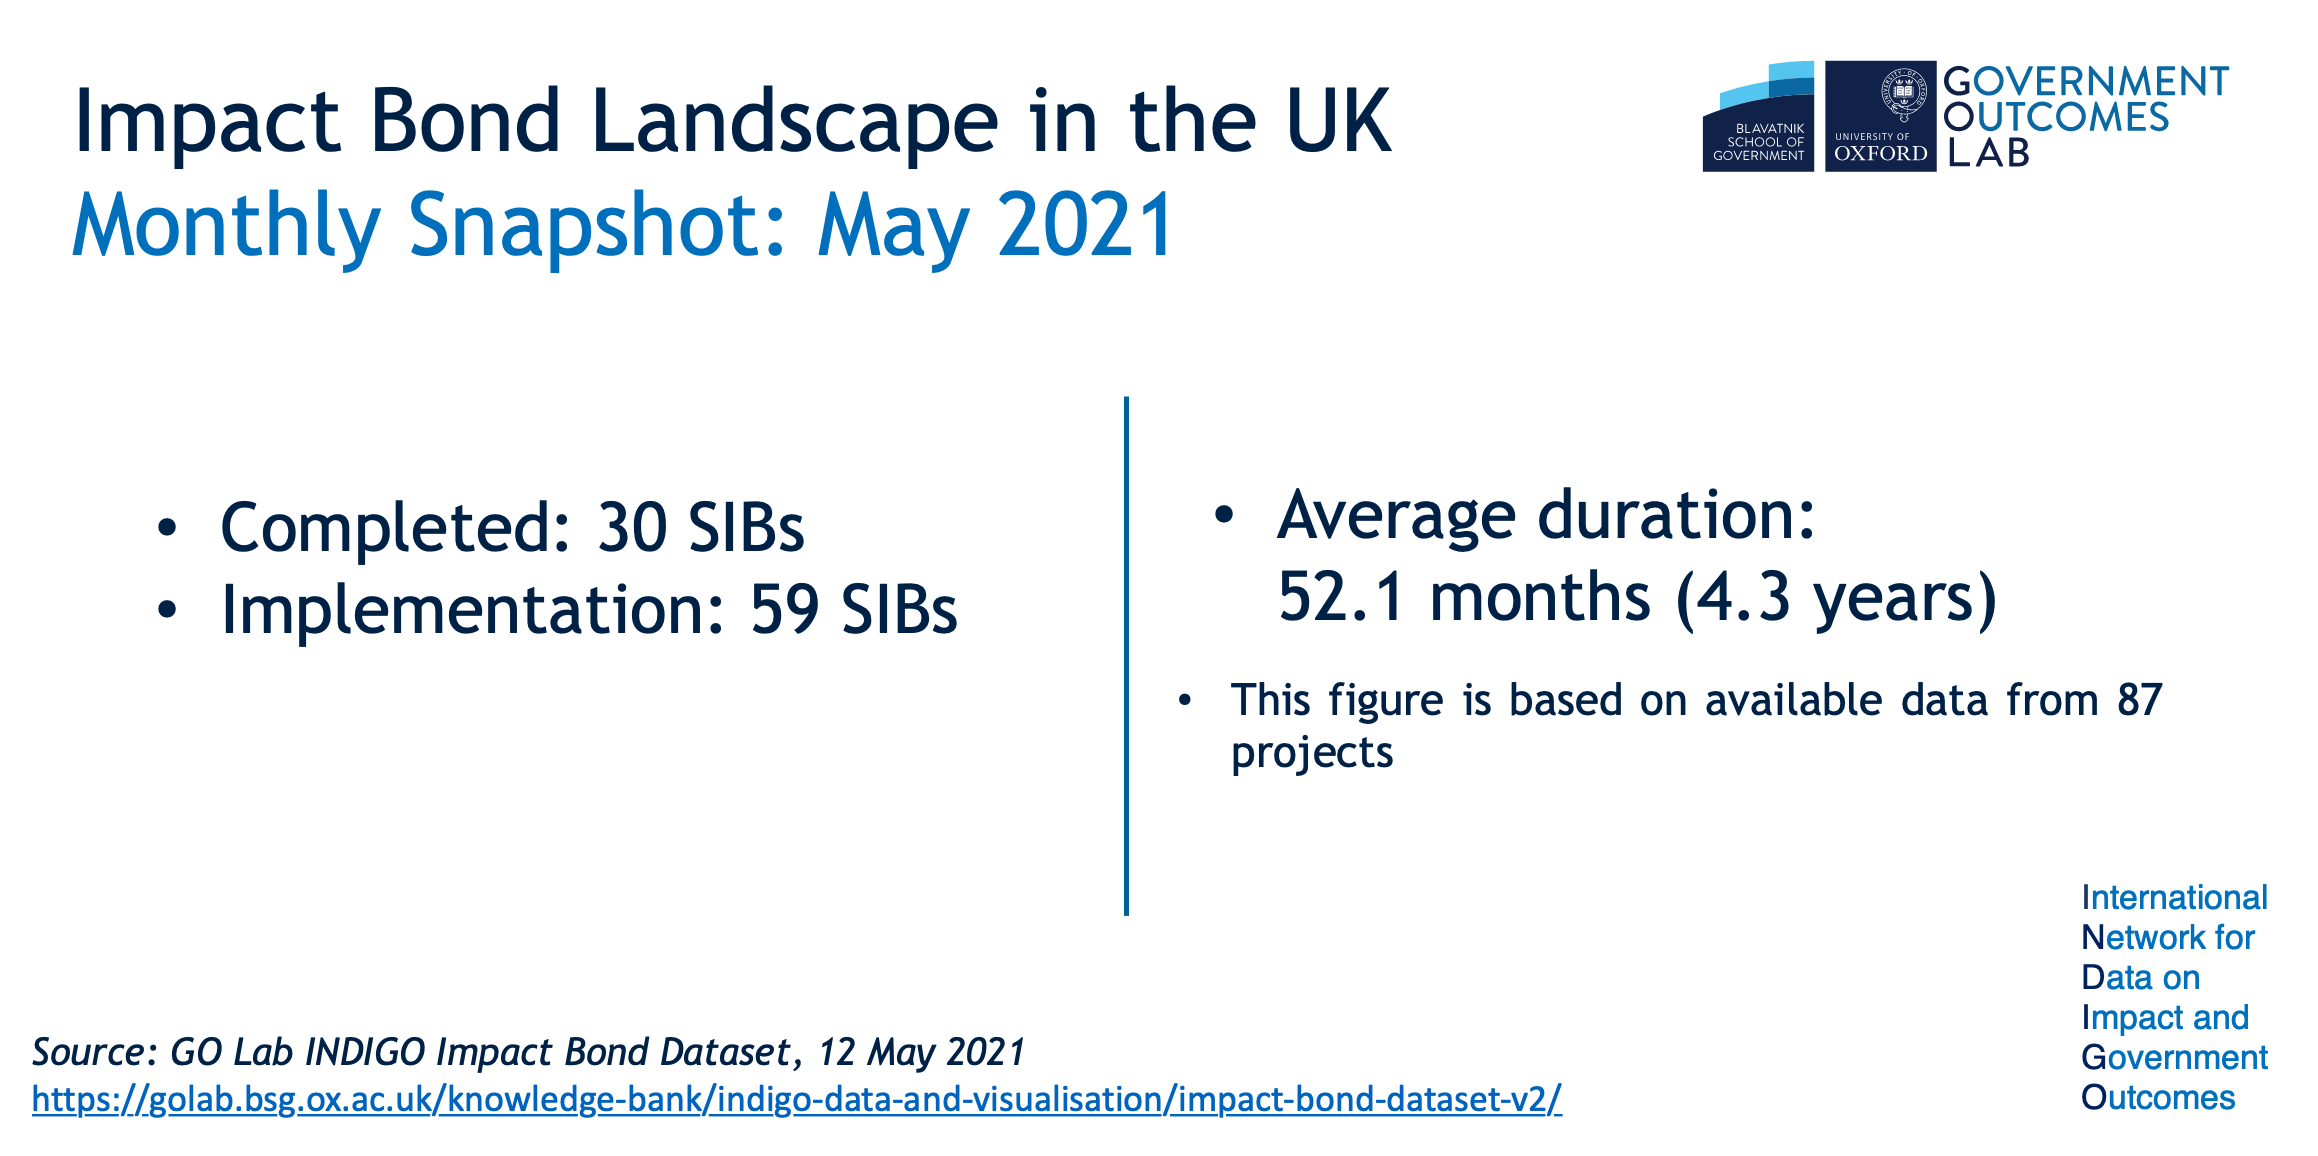 IB landscape May 21 - 6